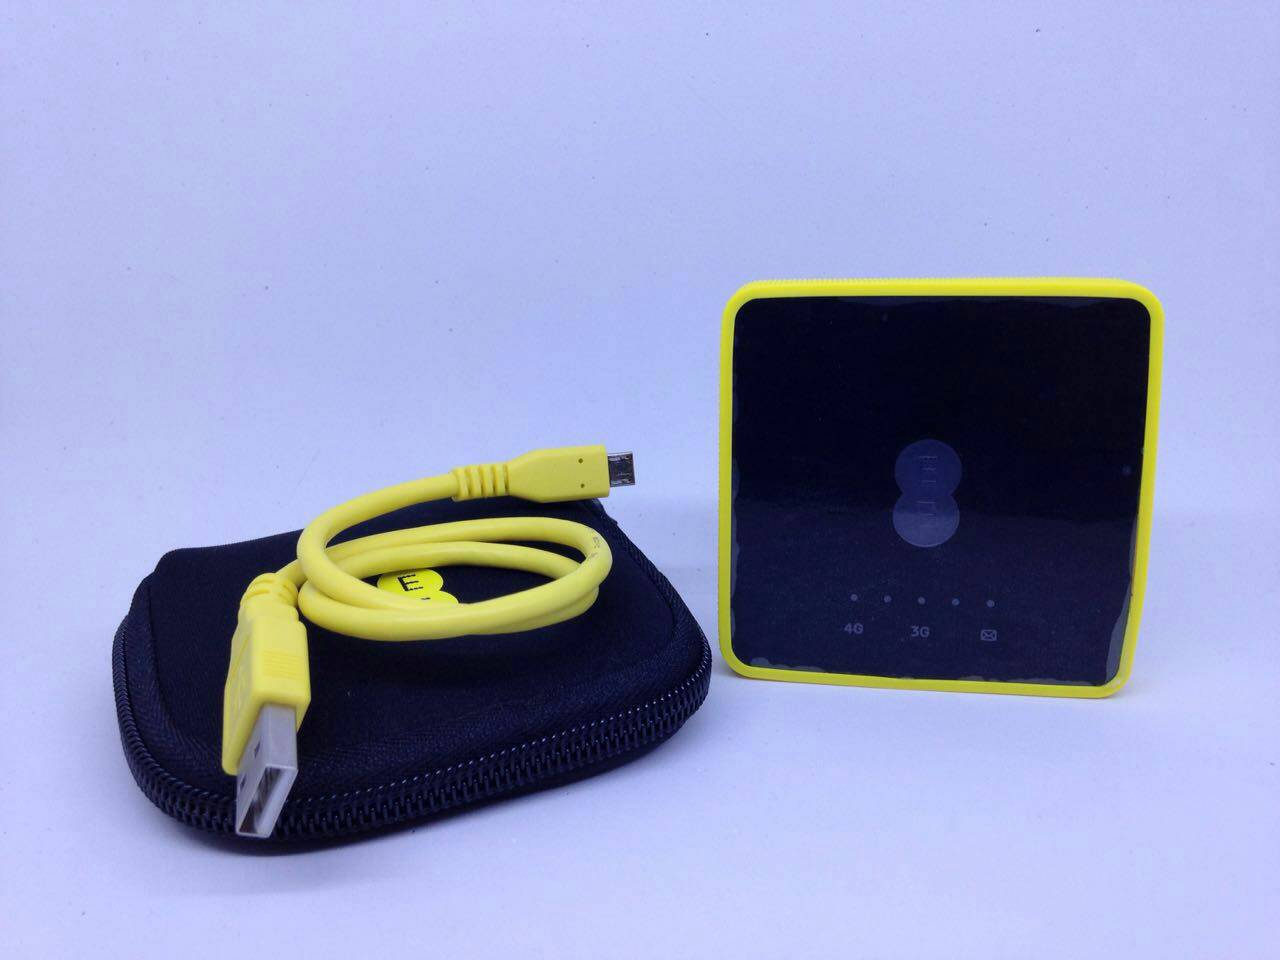 Jual Modem Mifi 4G LTE Alcatel Y853 Support 4GGSM